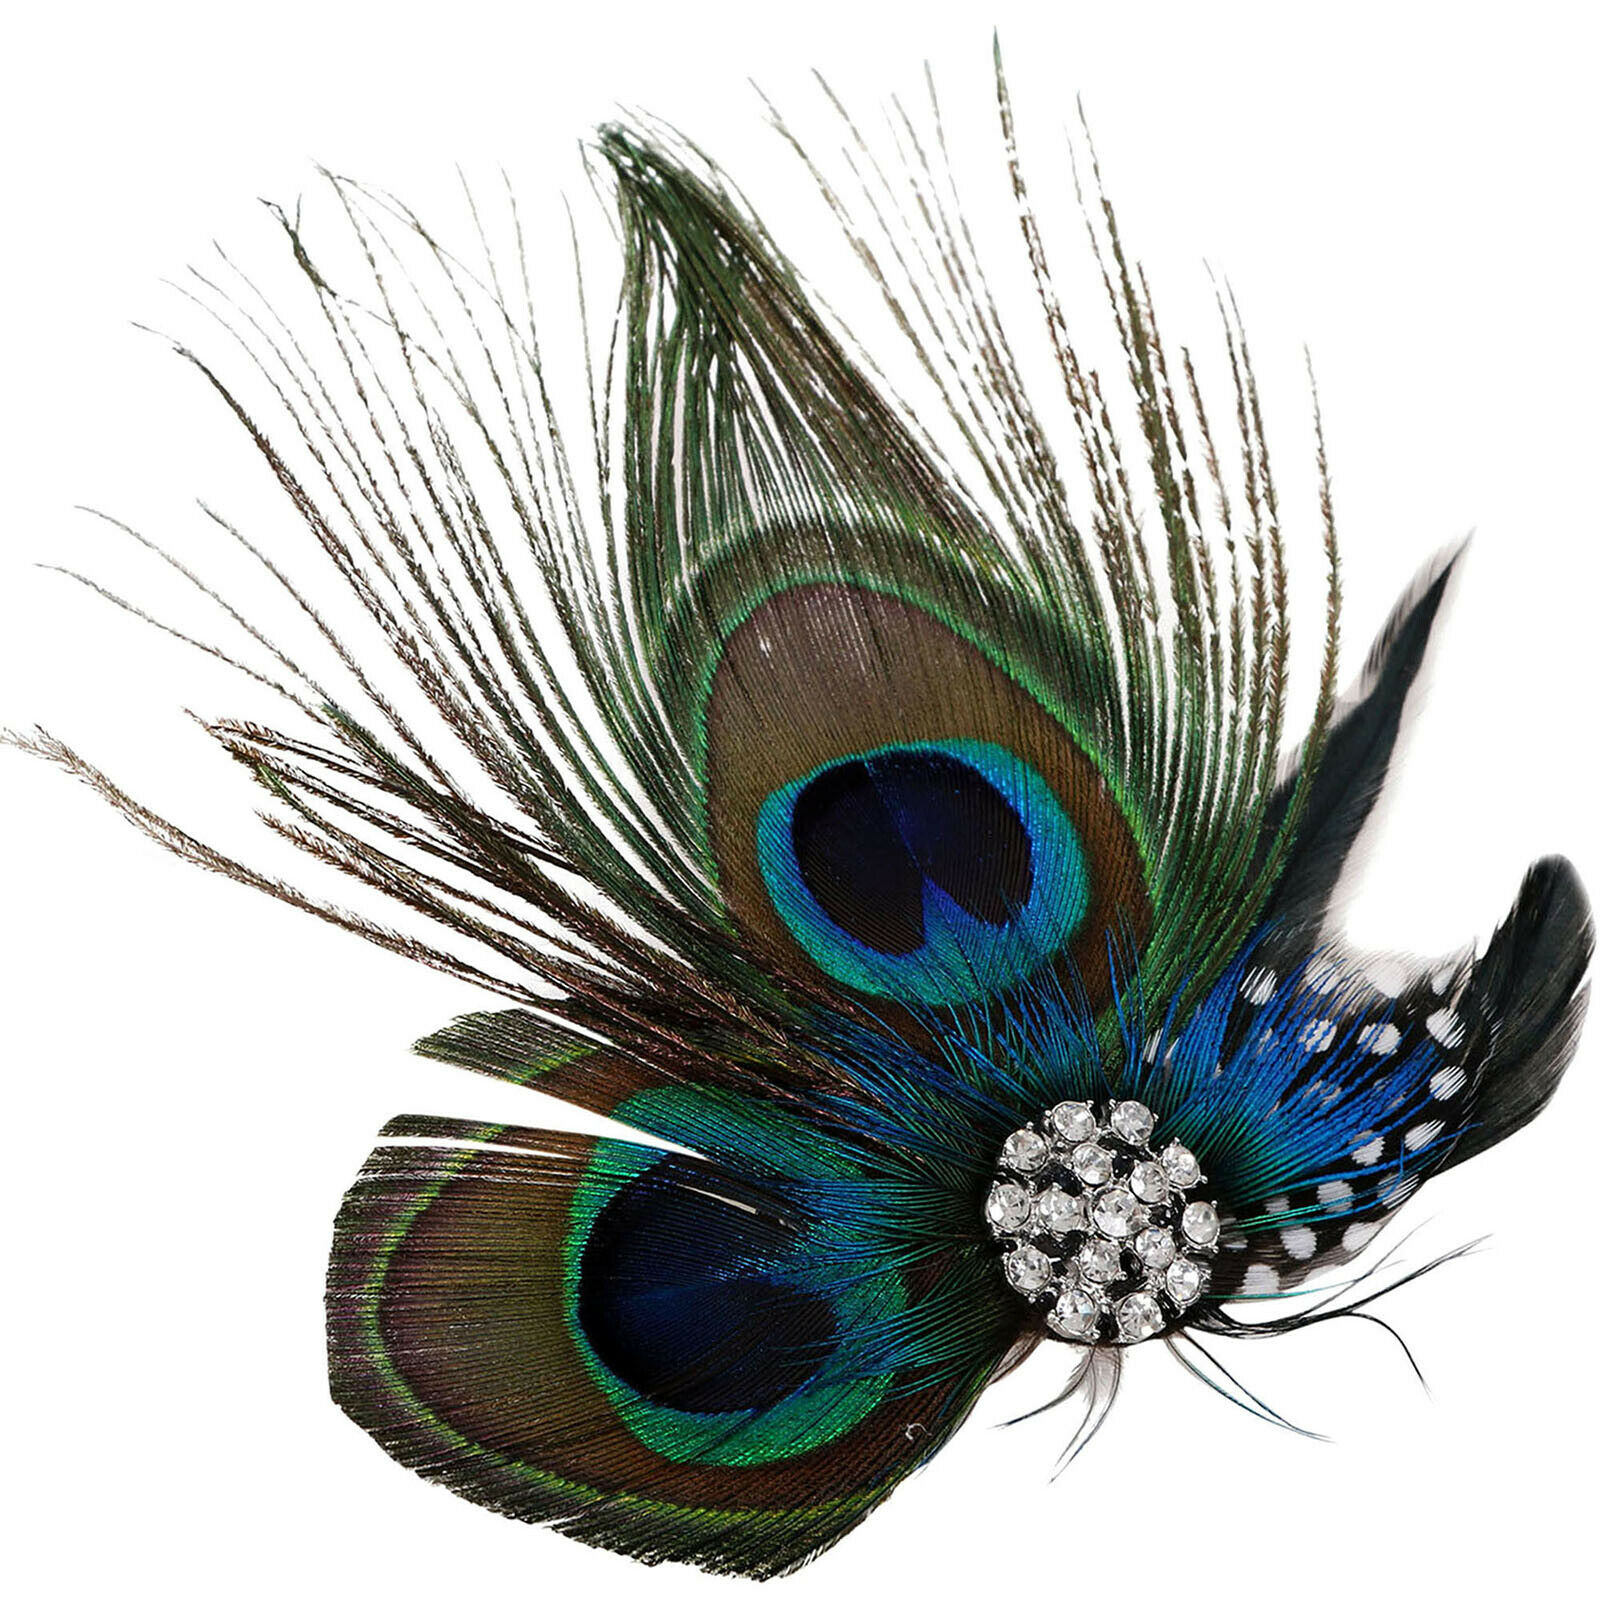 Vintage Women Peacock Feather Bridal Wedding Hair Clip Headpiece Hair Accessory